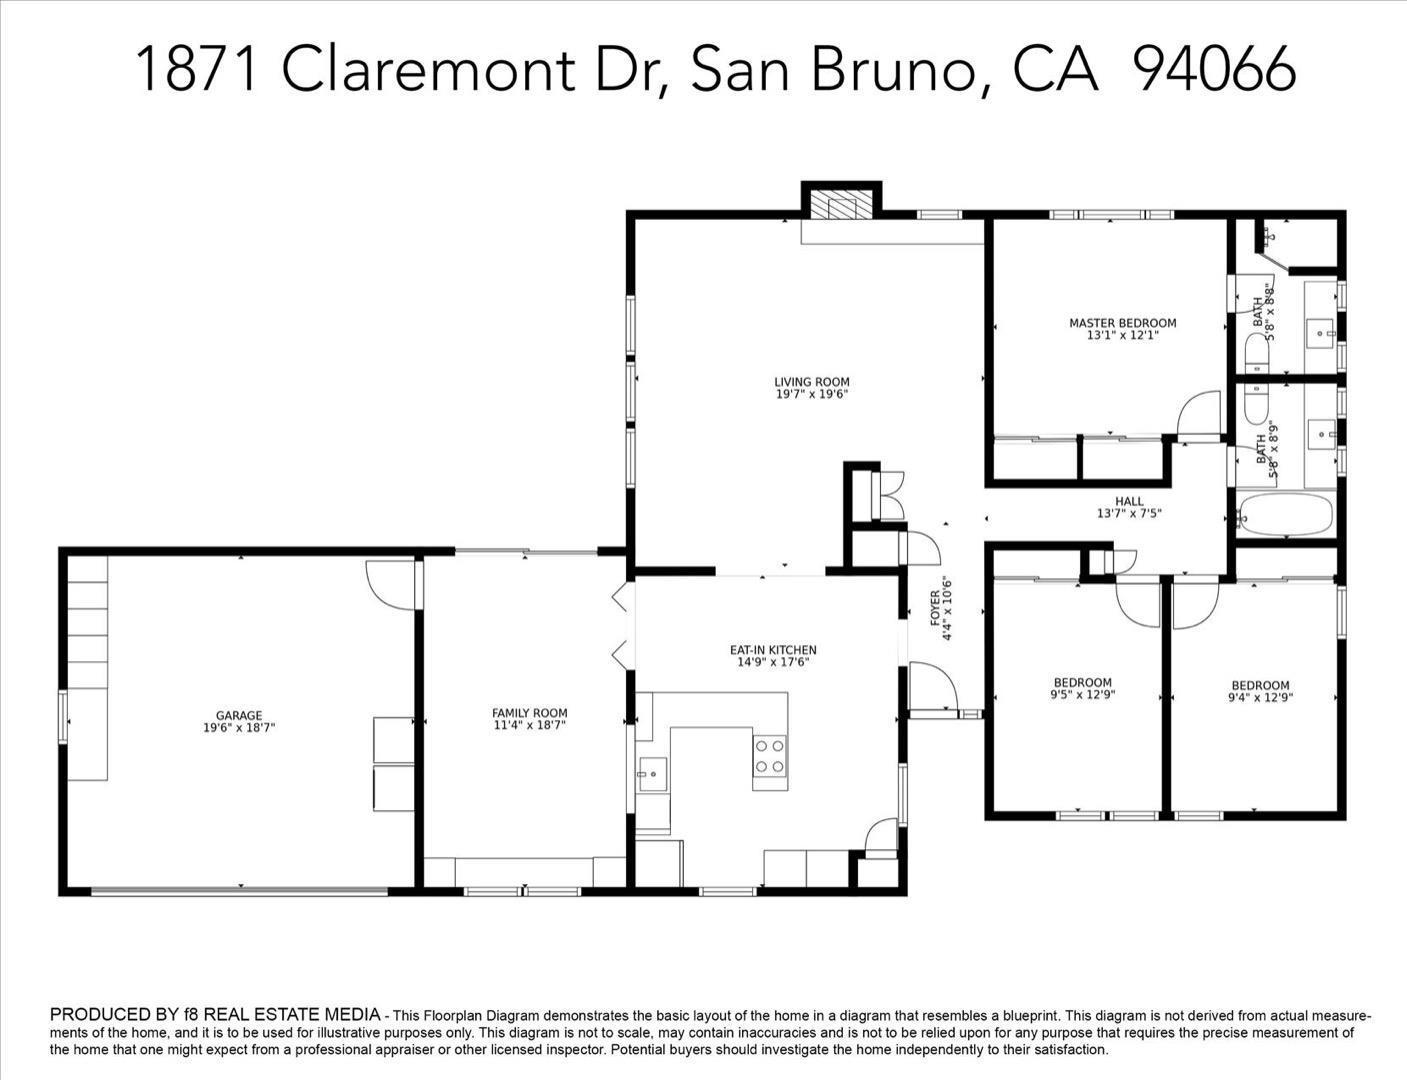 1871 Claremont DR photo